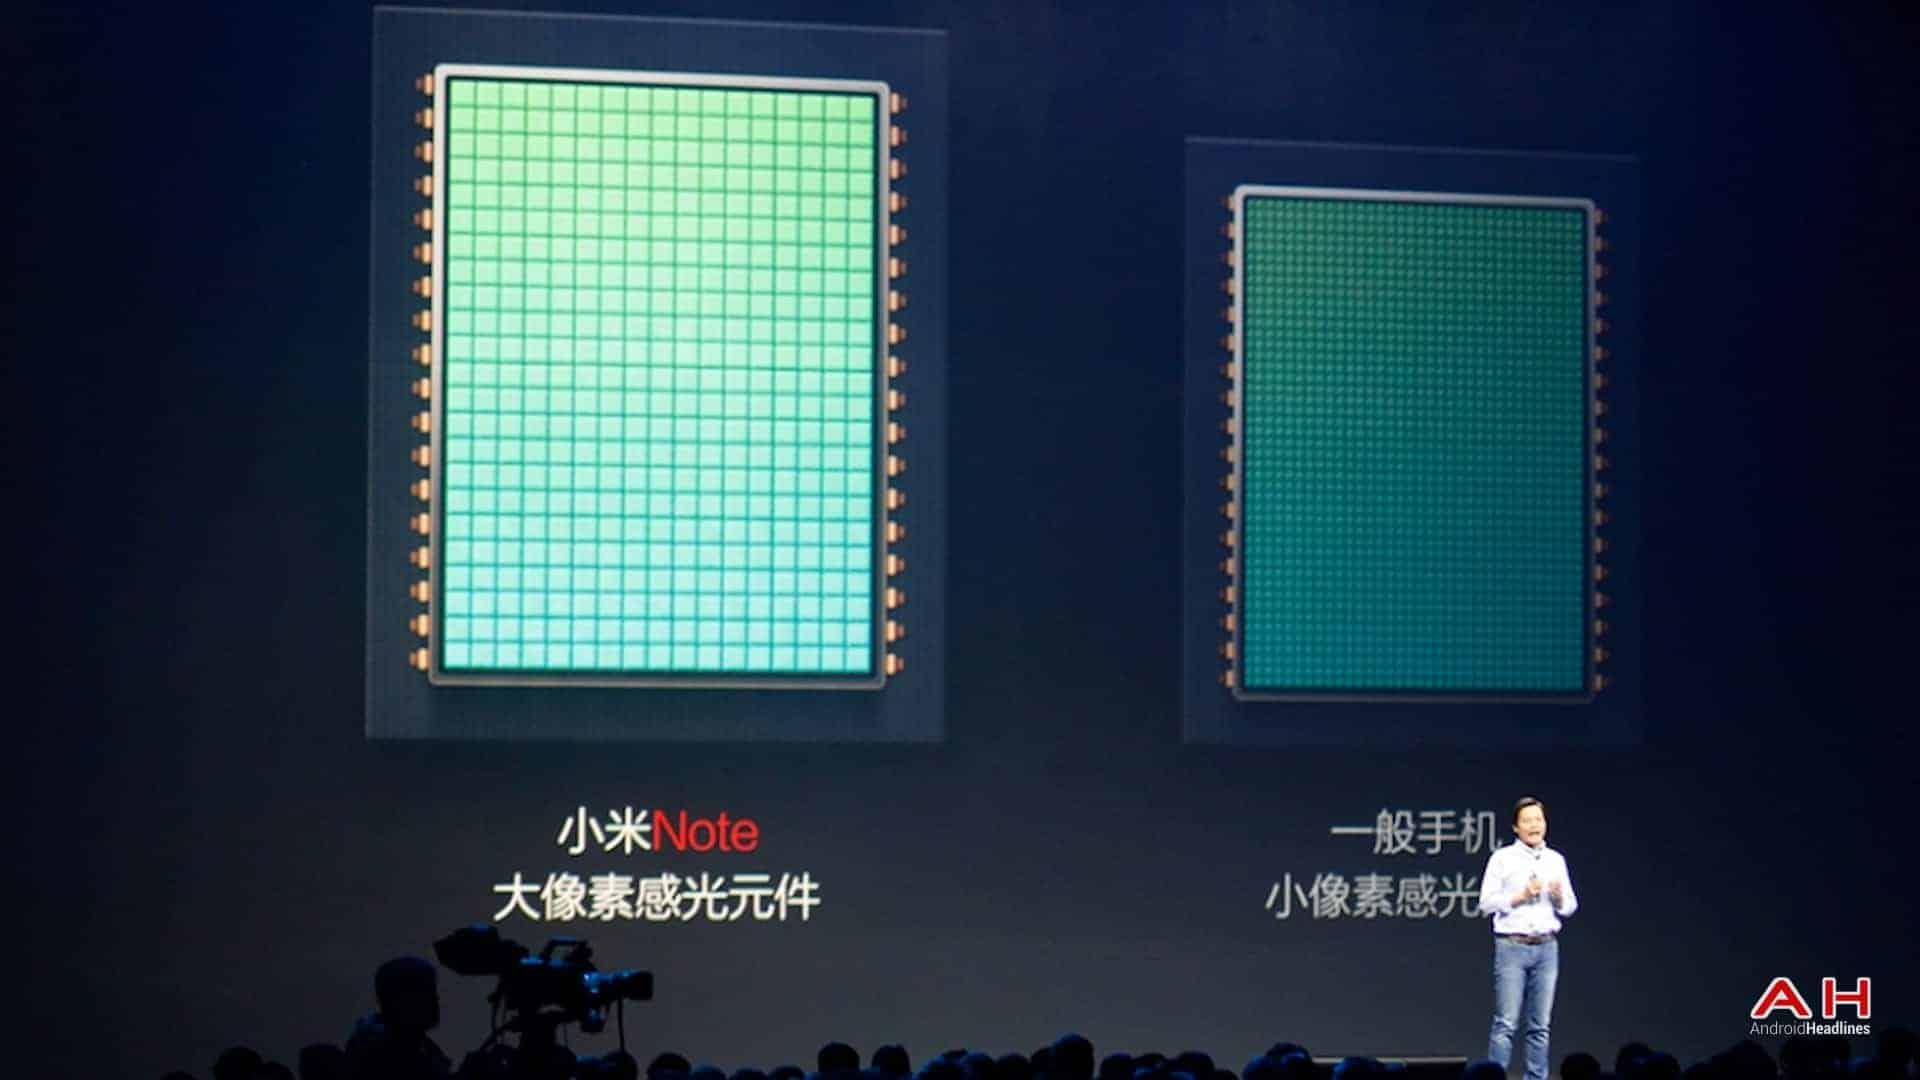 AH Xiaomi Note 12